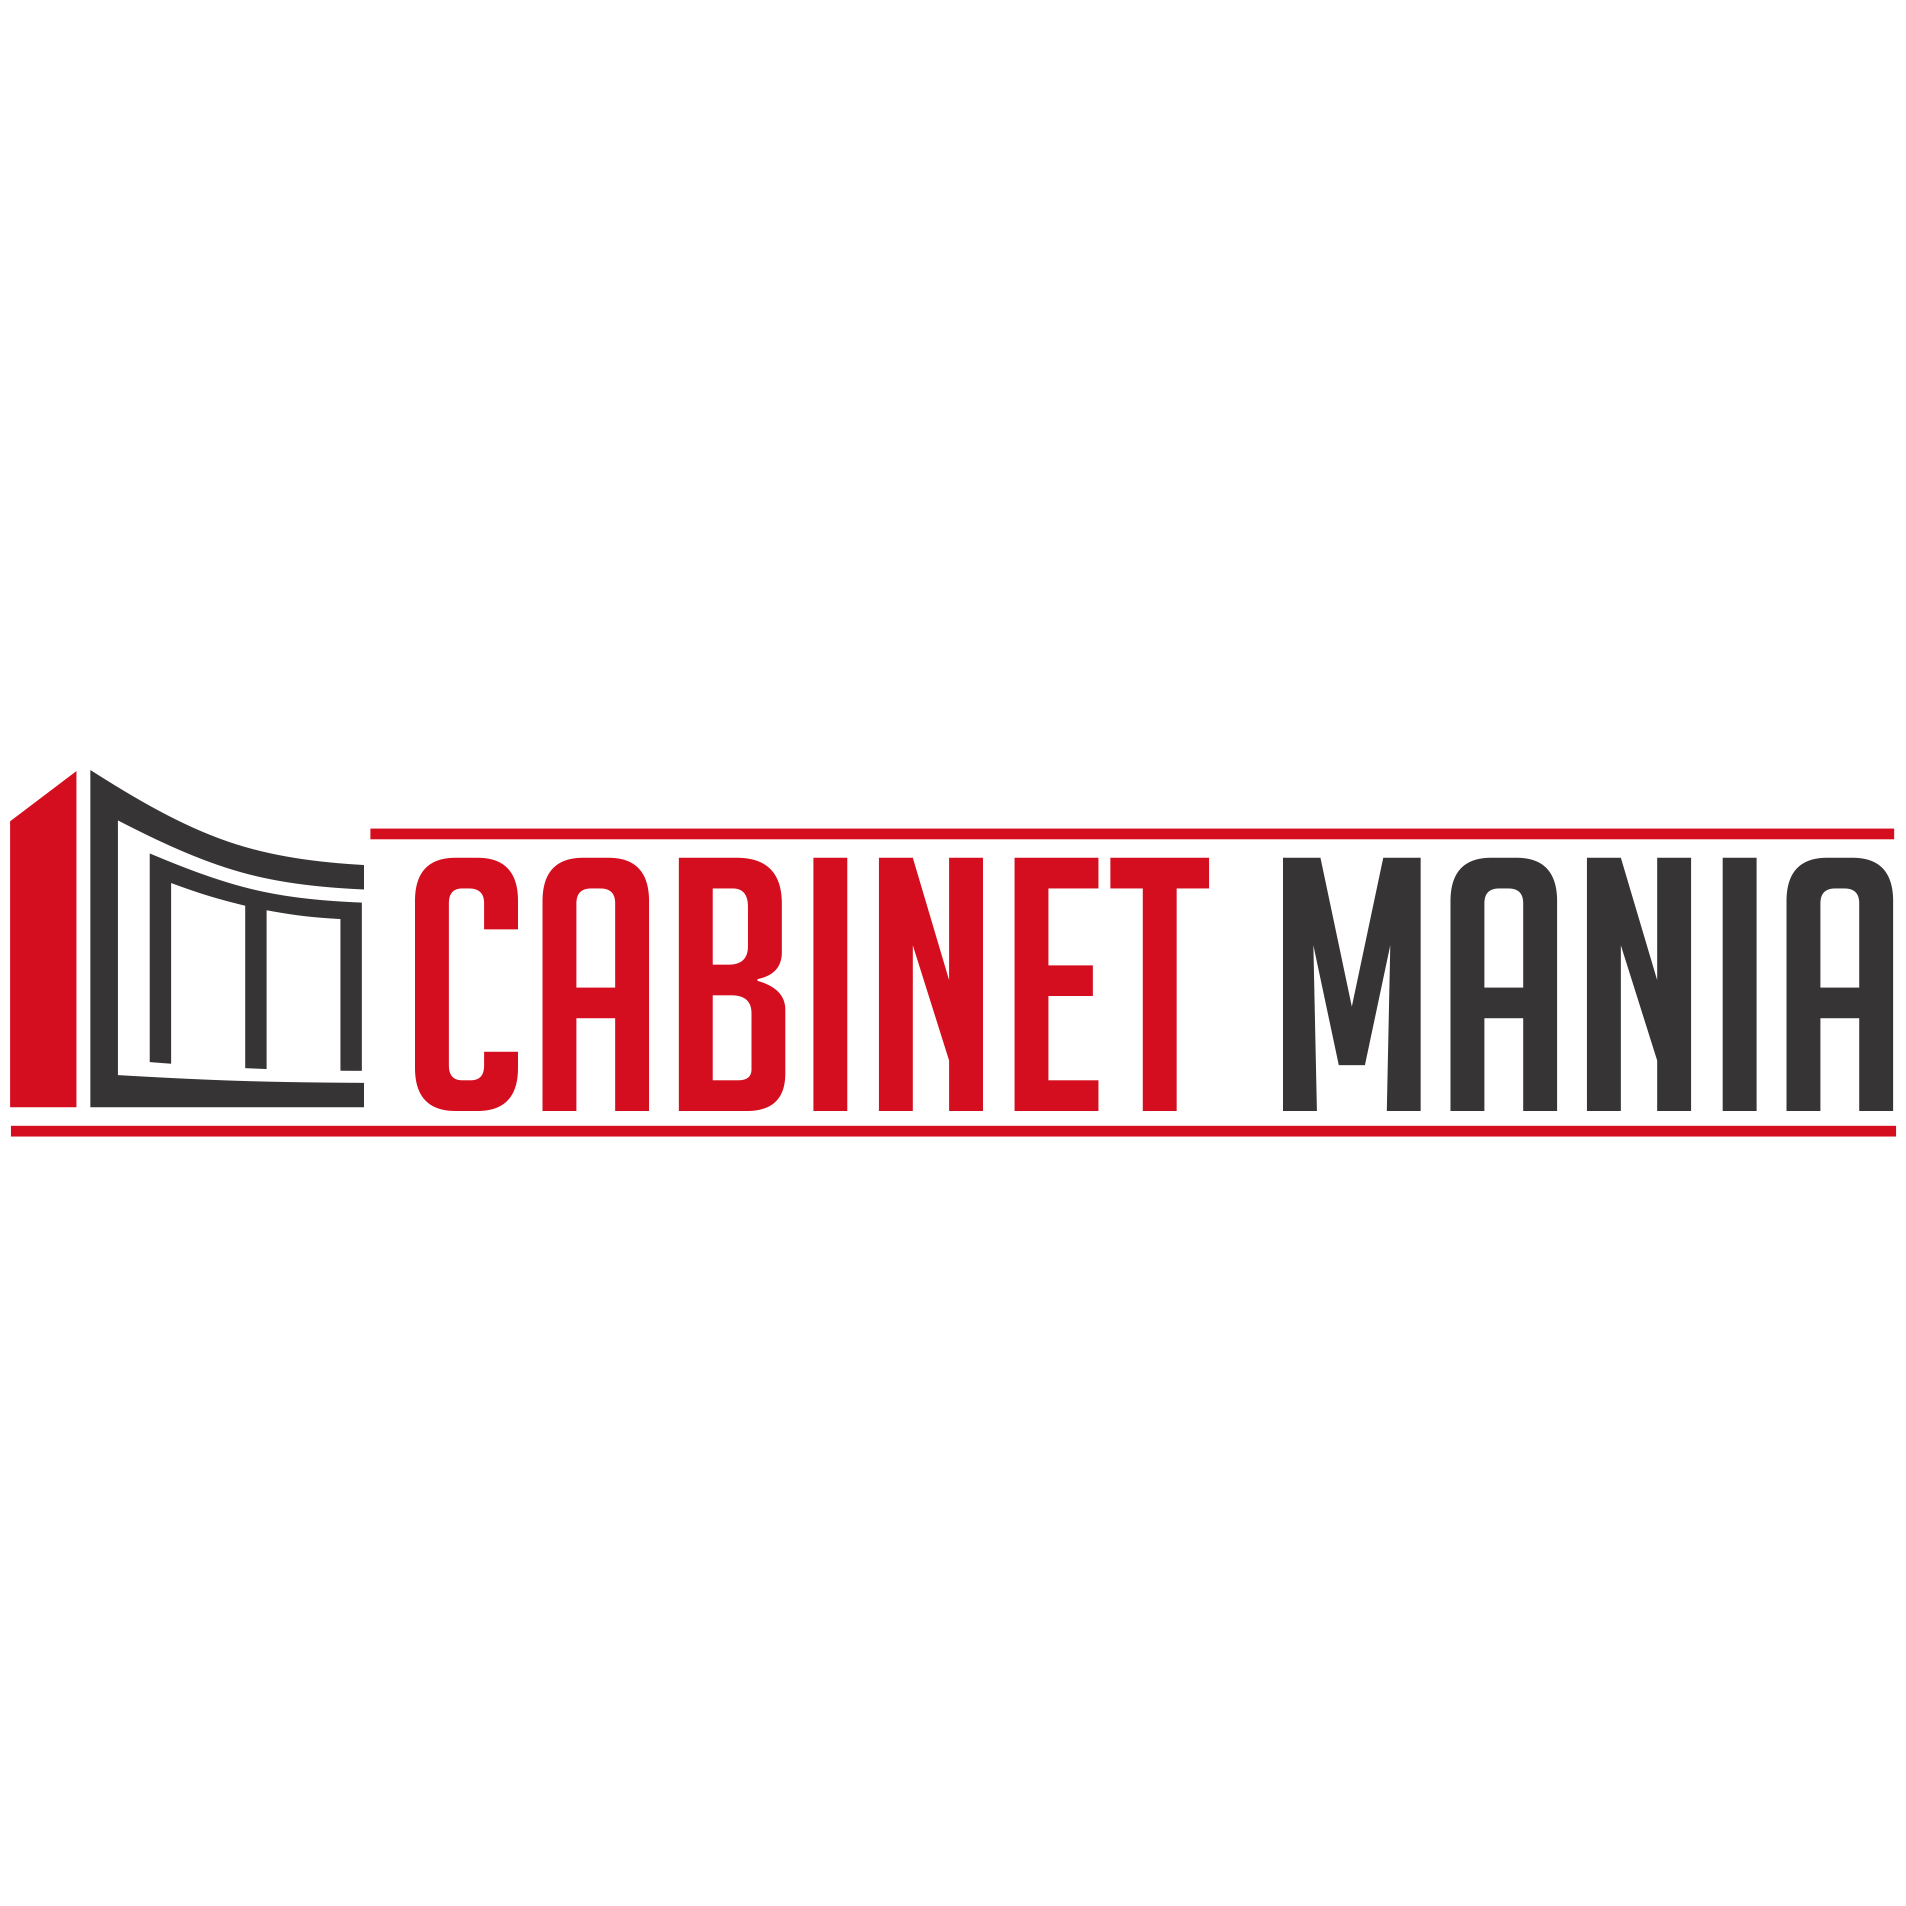 CabinetMania.com image 5